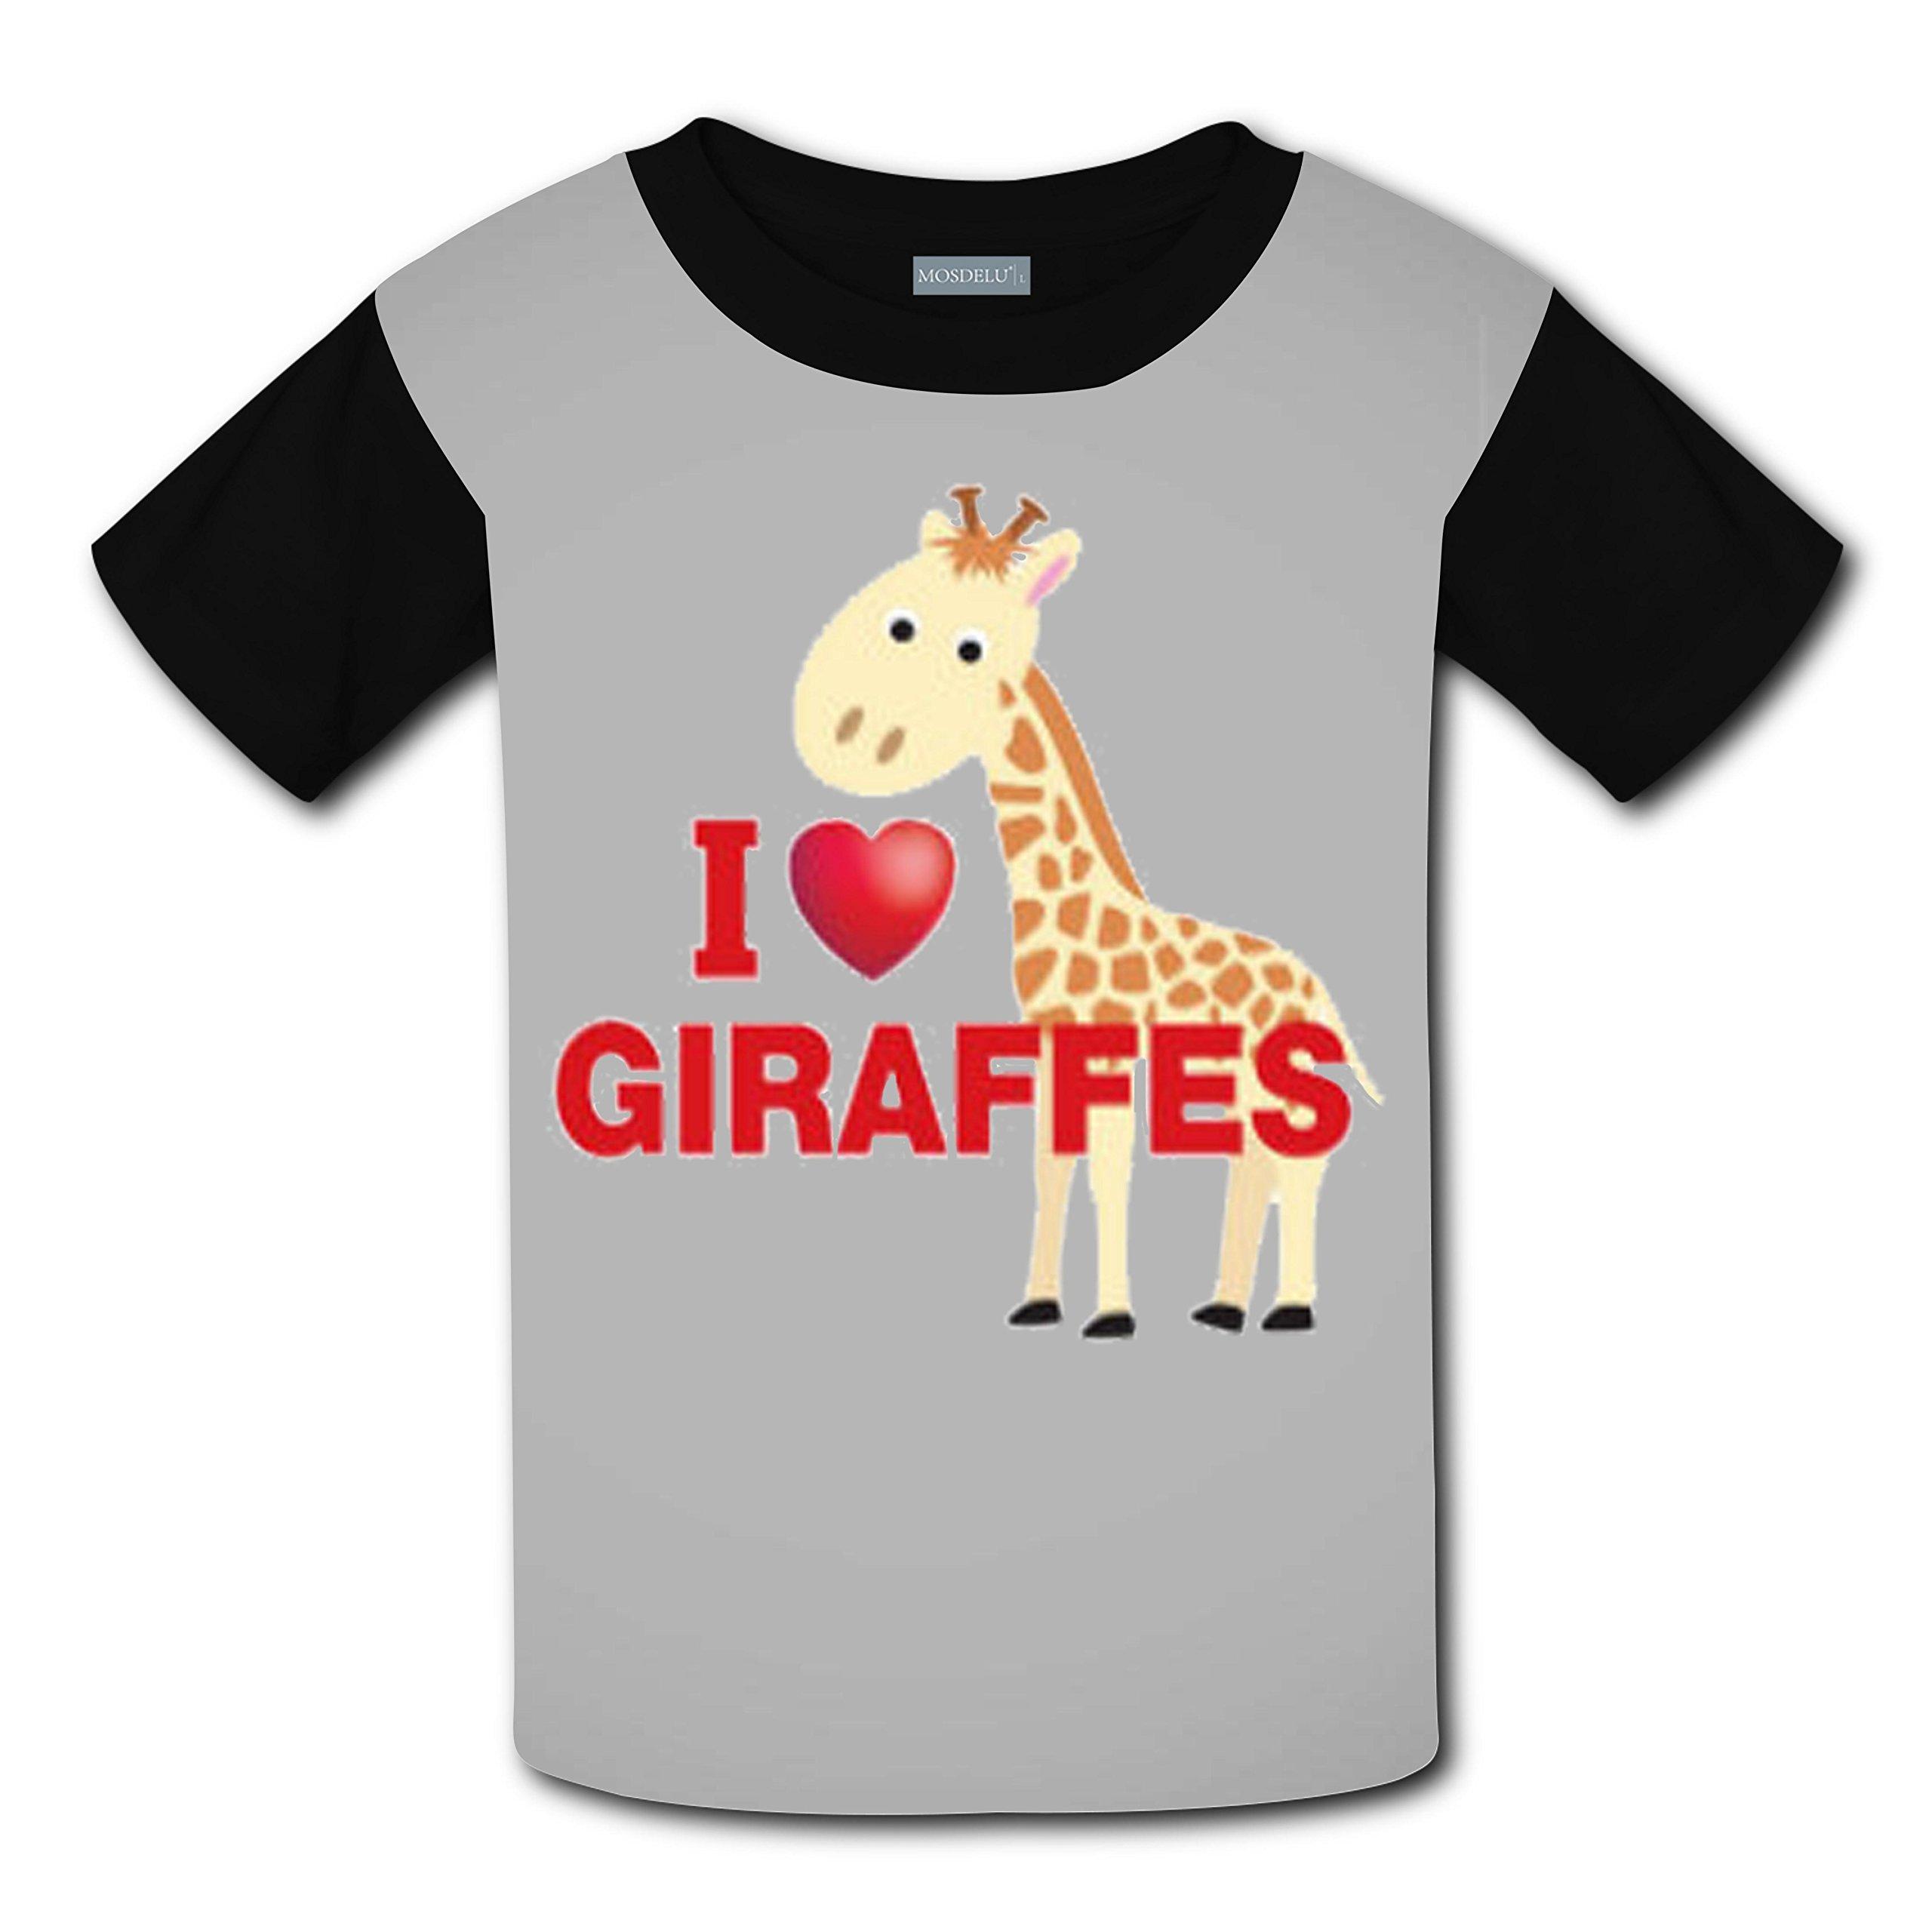 Unisex Kids I Love Giraffe 3D Printed Round Collar Short Sleeve T- Shirt